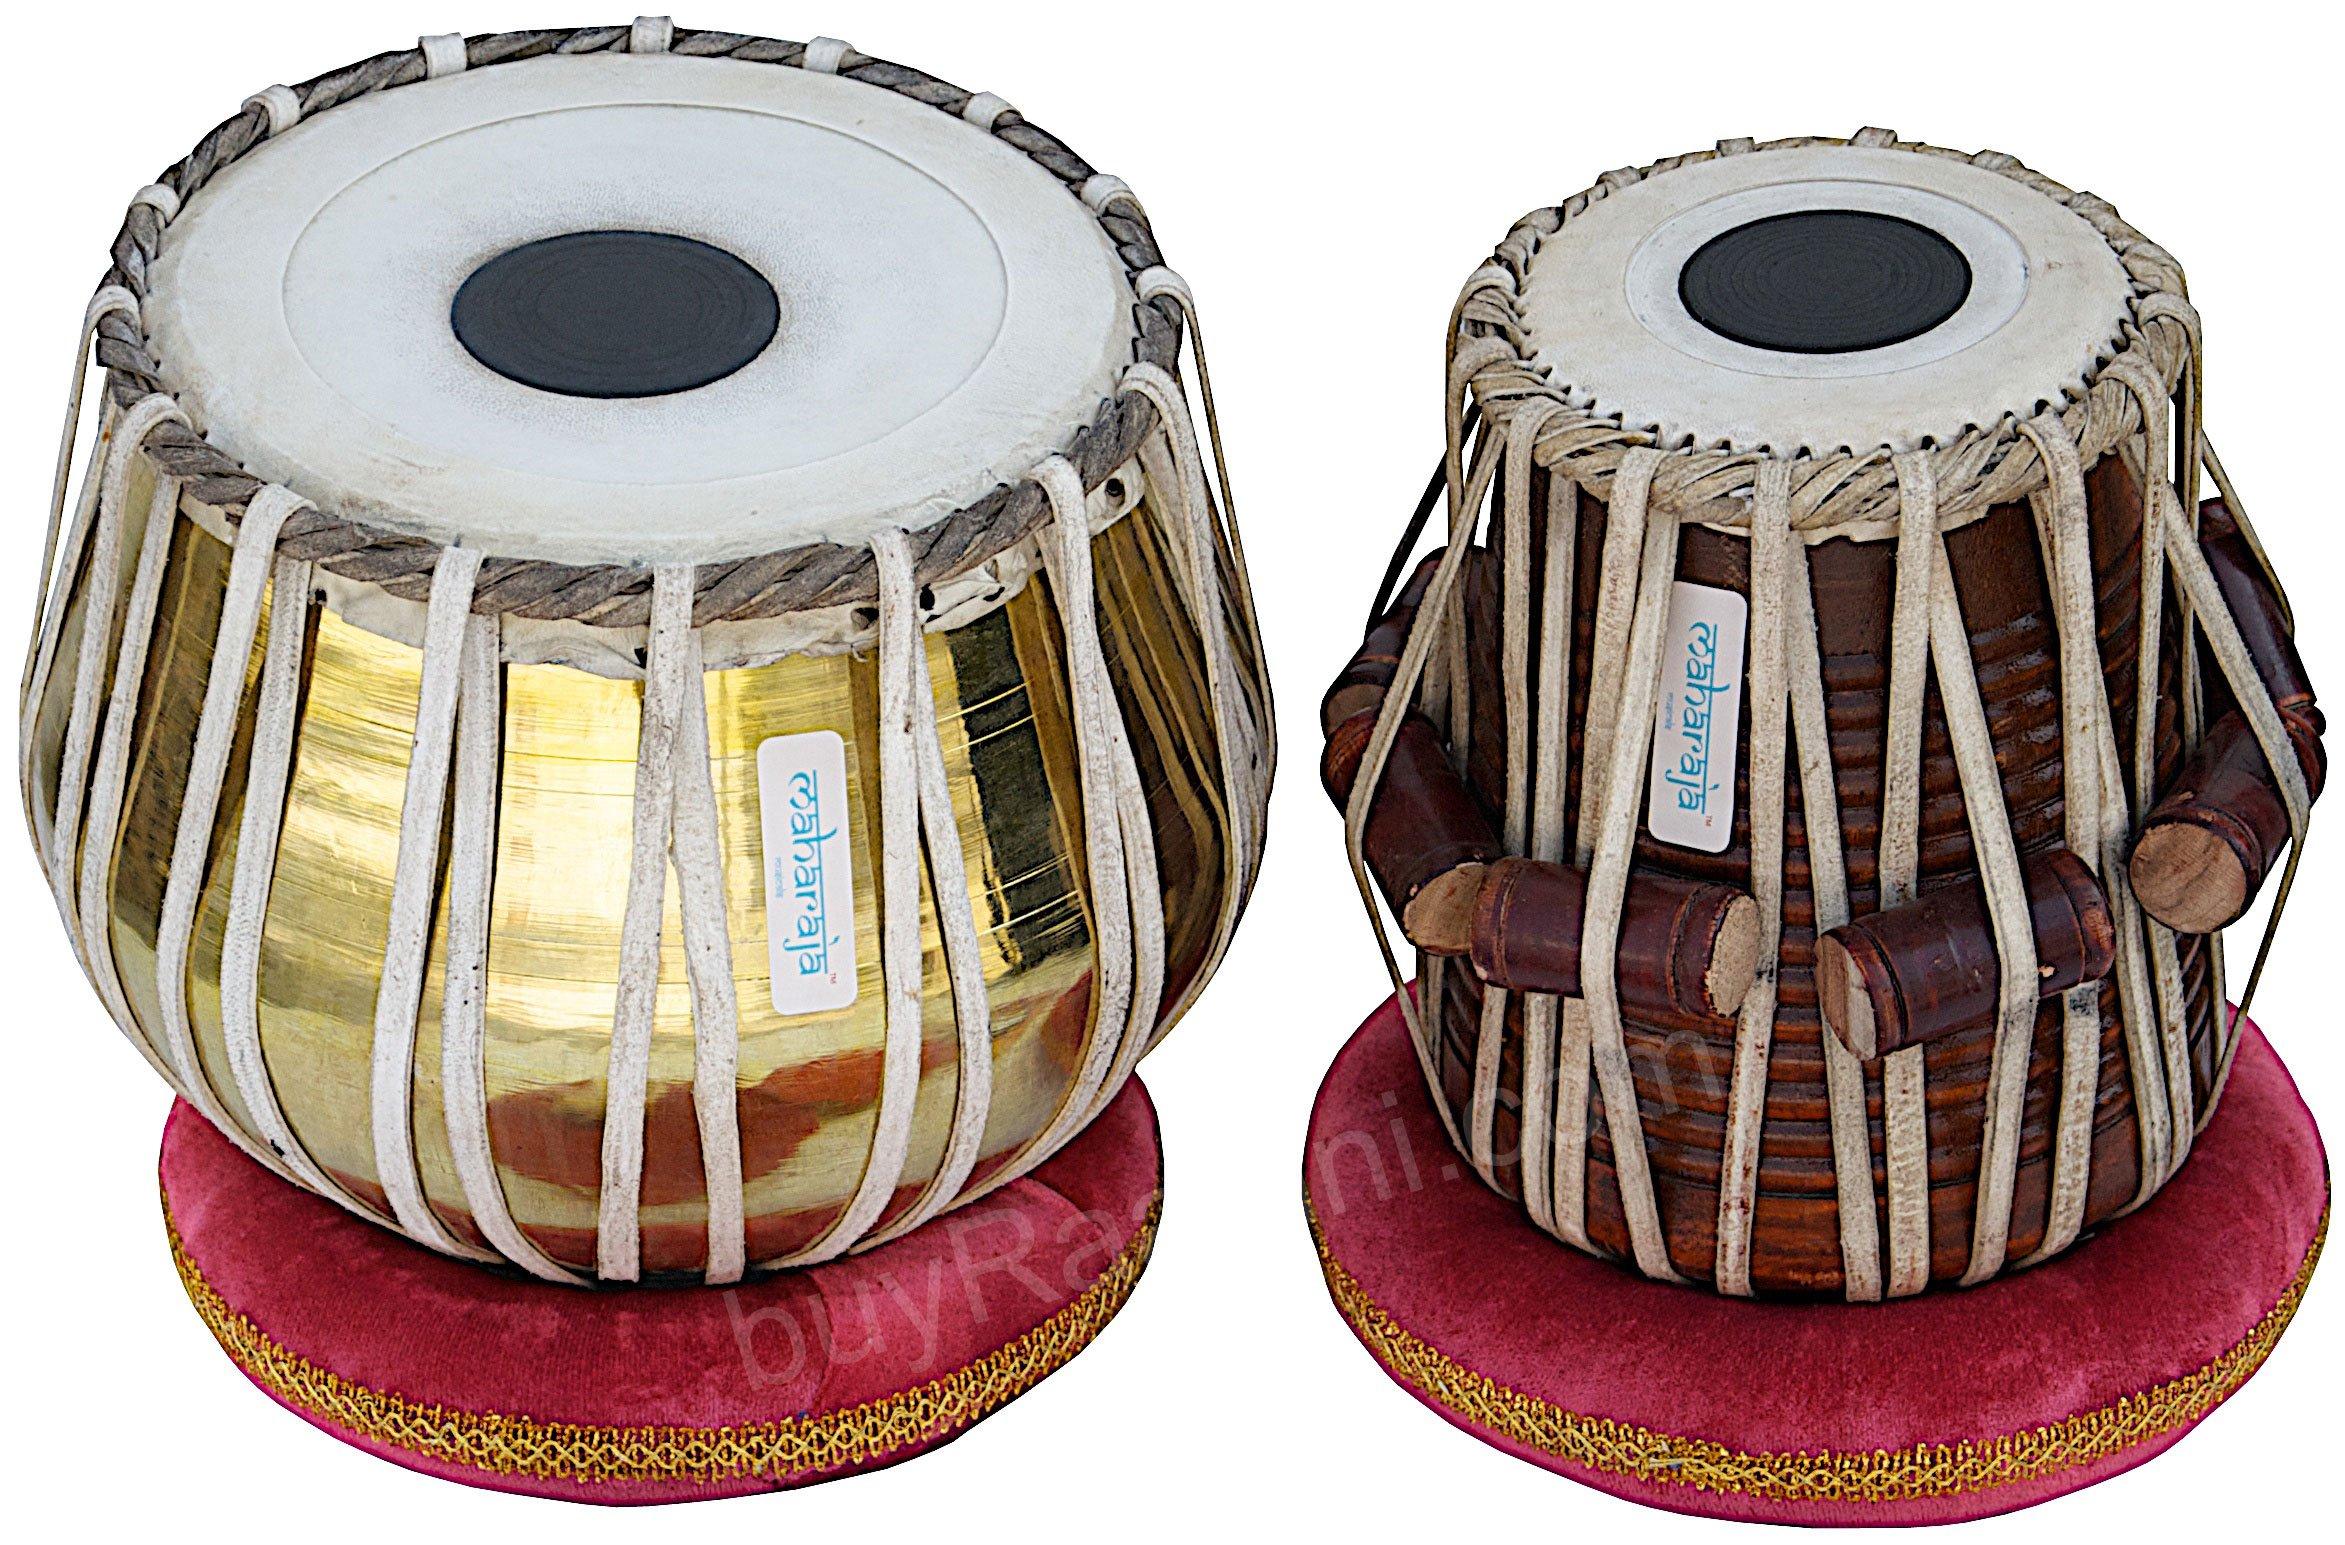 Tabla Set by Maharaja Musicals, Golden Brass Bayan 3Kg, Sheesham Dayan Tabla, Nylon Bag, Hammer, Book, Cushions, Cover, Tabla Indian Drums (PDI-CH) by Maharaja Musicals (Image #2)